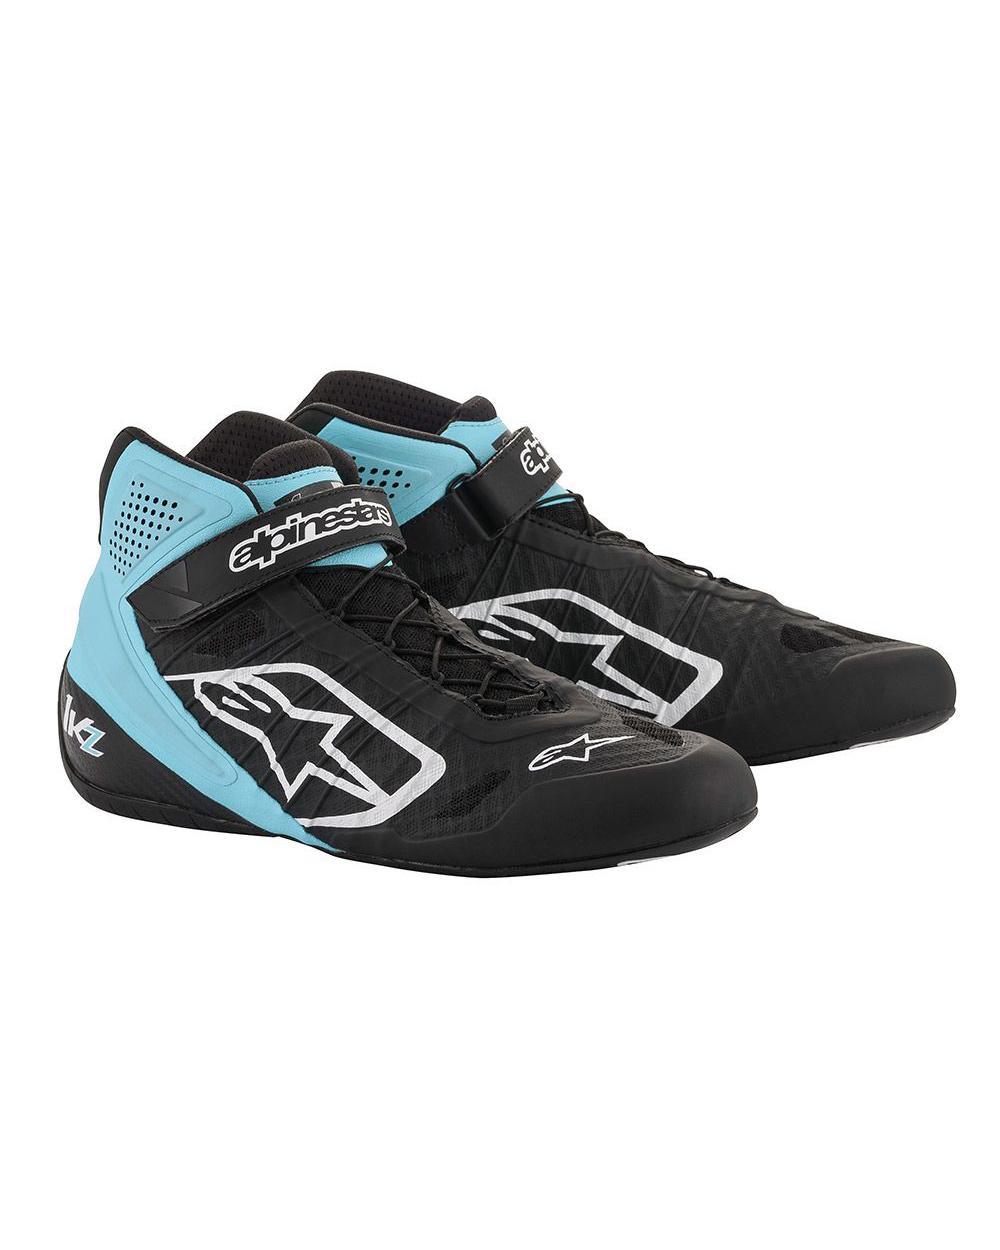 Alpinestars Tech-1 KZ Shoe Black Turquoise